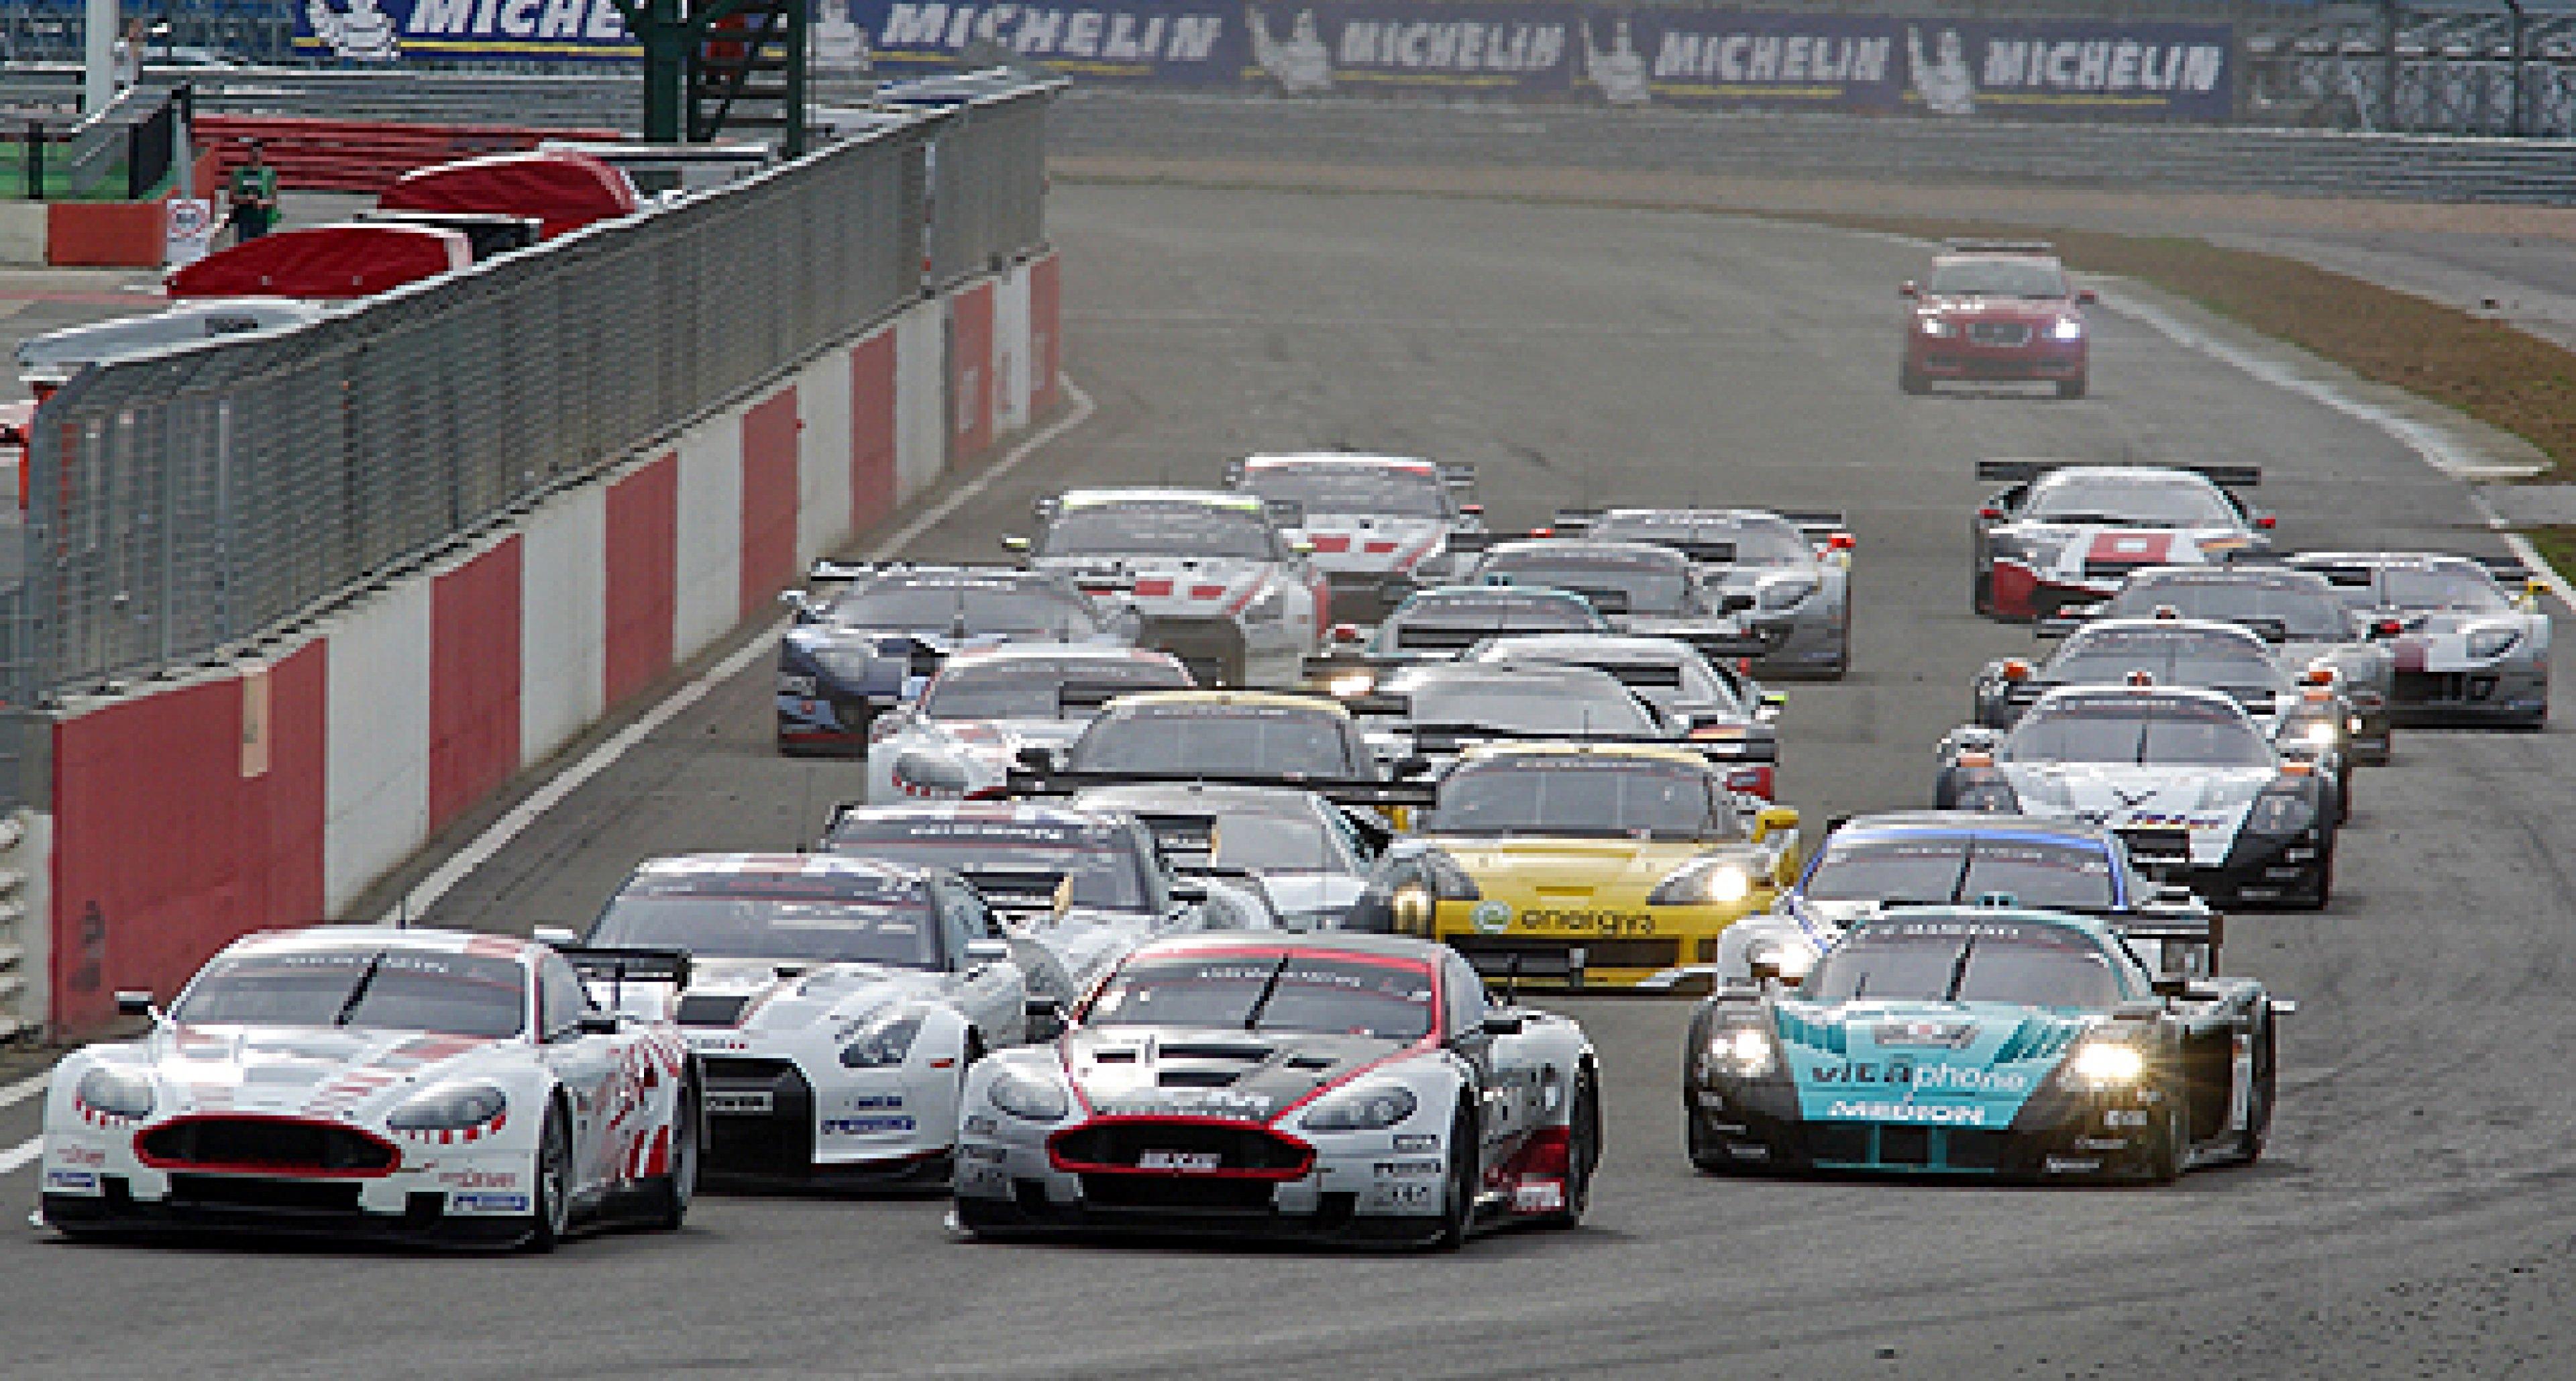 'Silverstone Supercar' Royal Automobile Club Tourist Trophy 2010